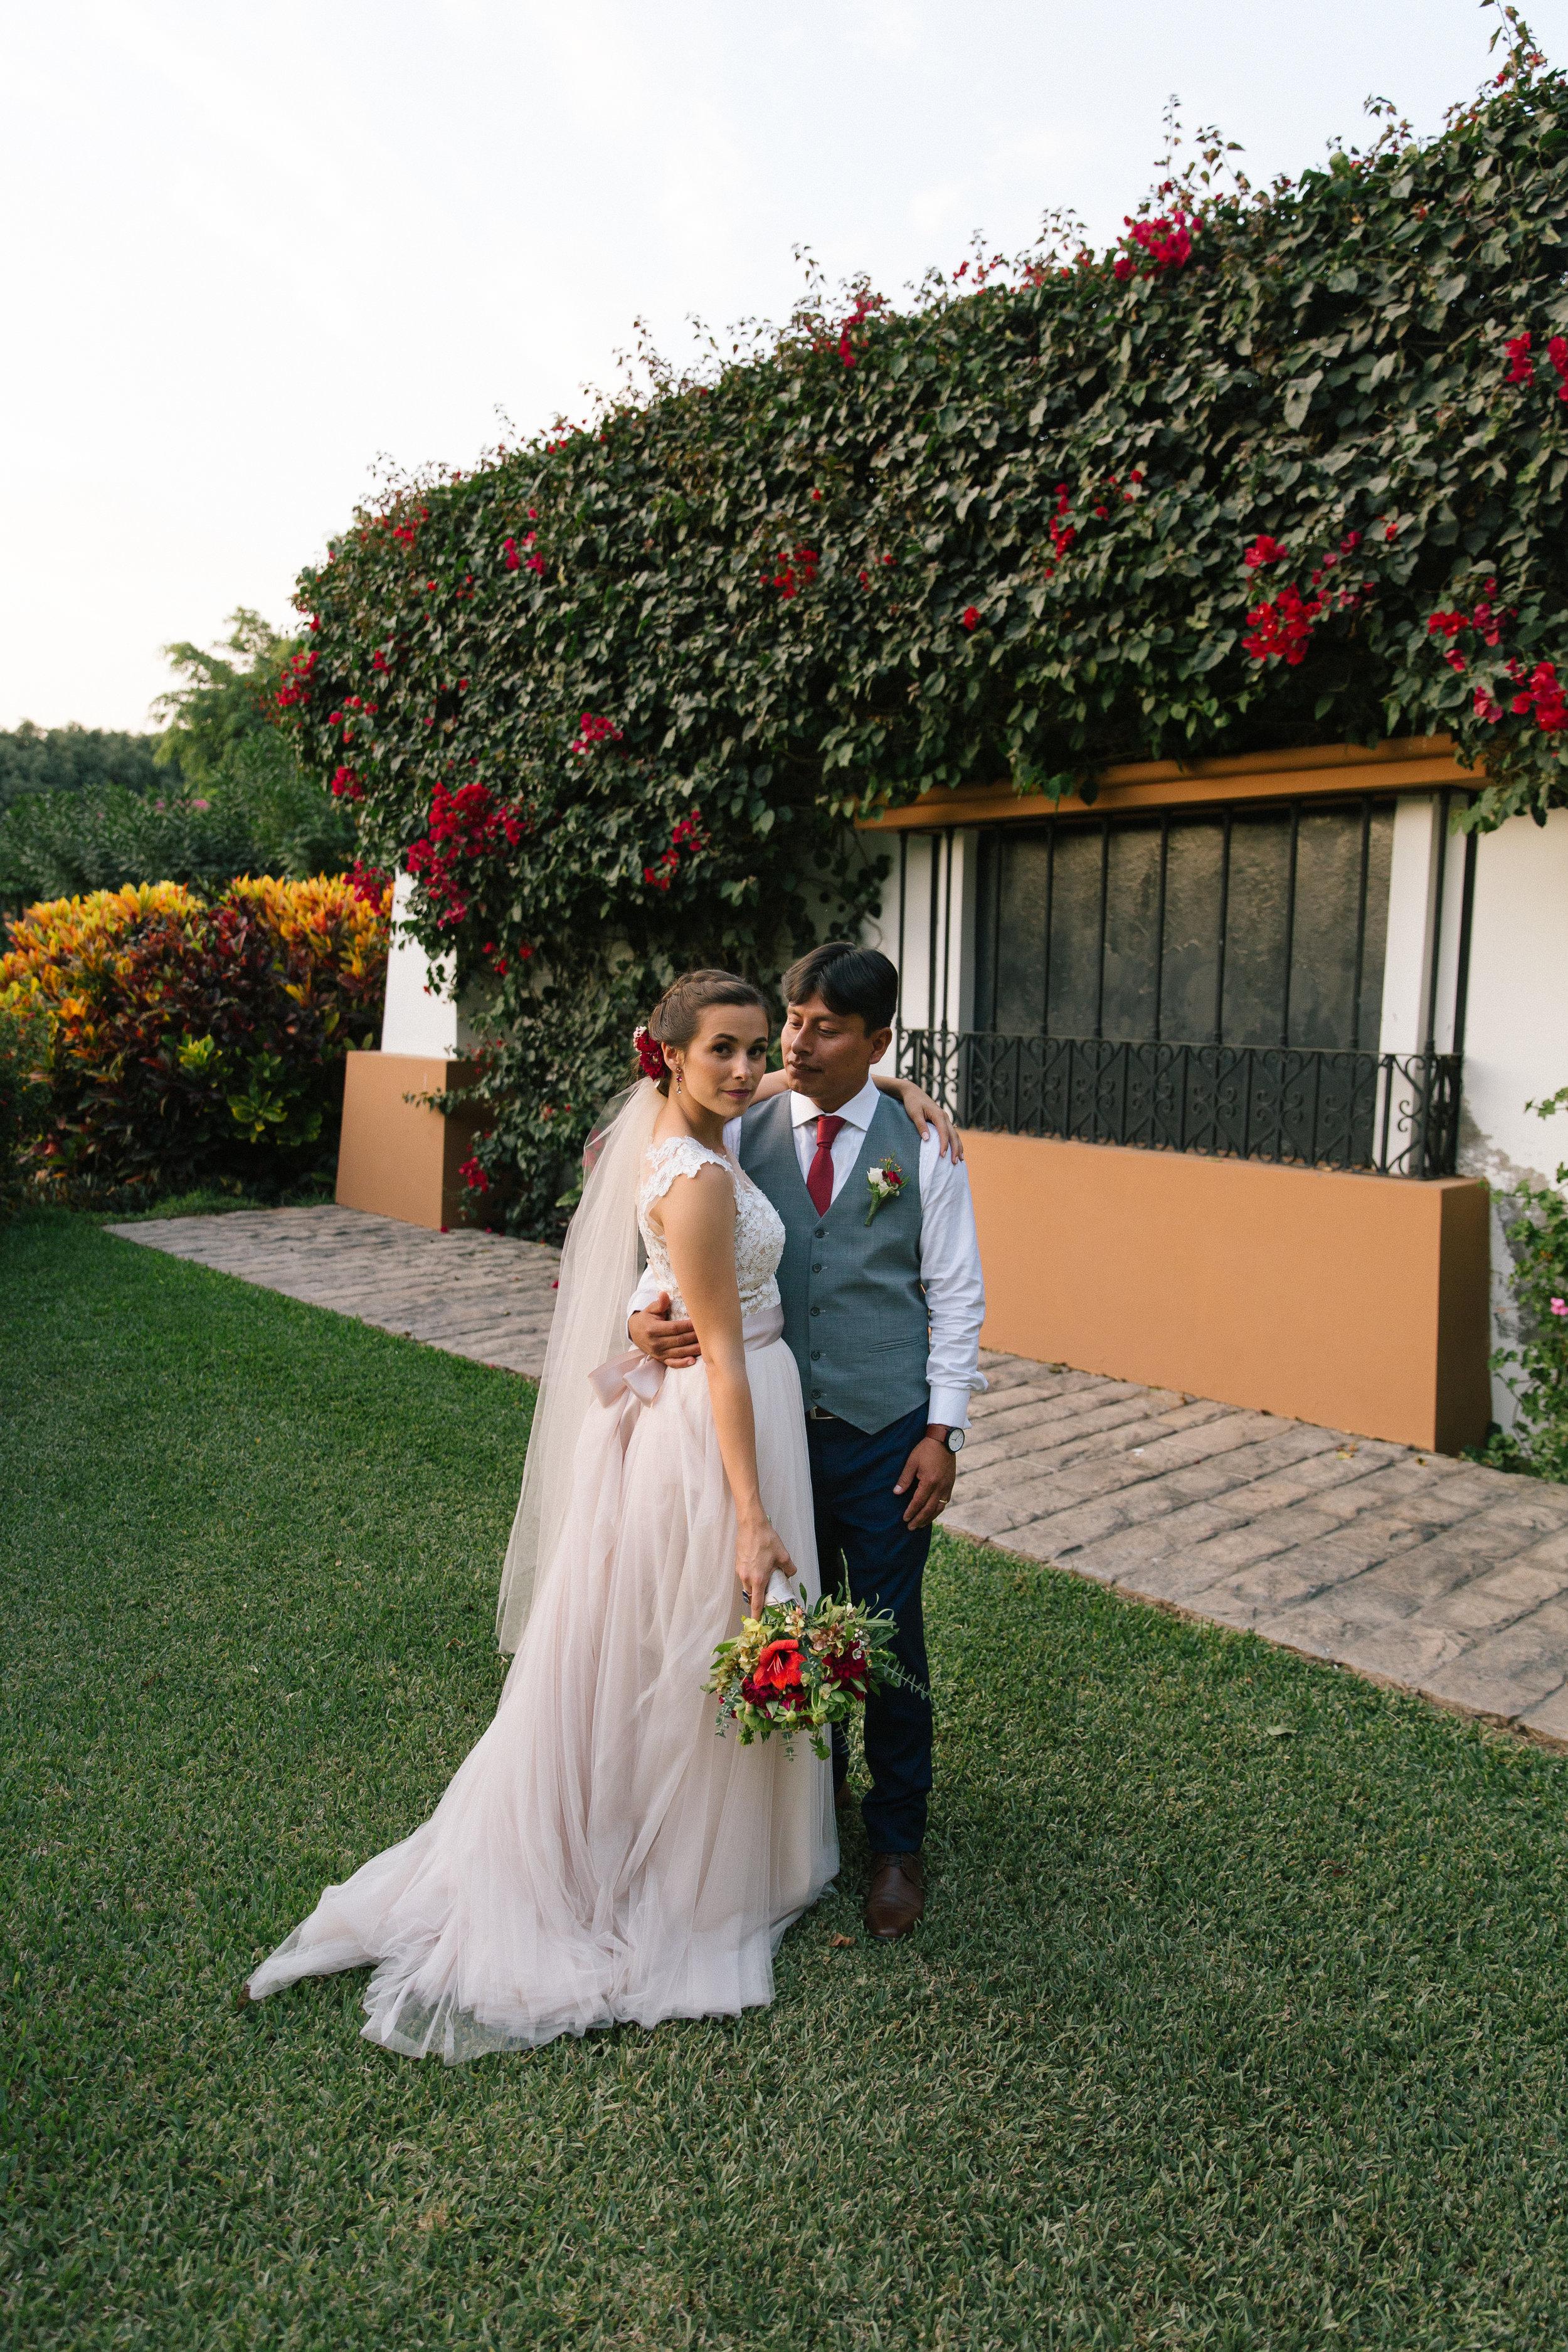 JE_WeddingPortraits_1-2.jpg